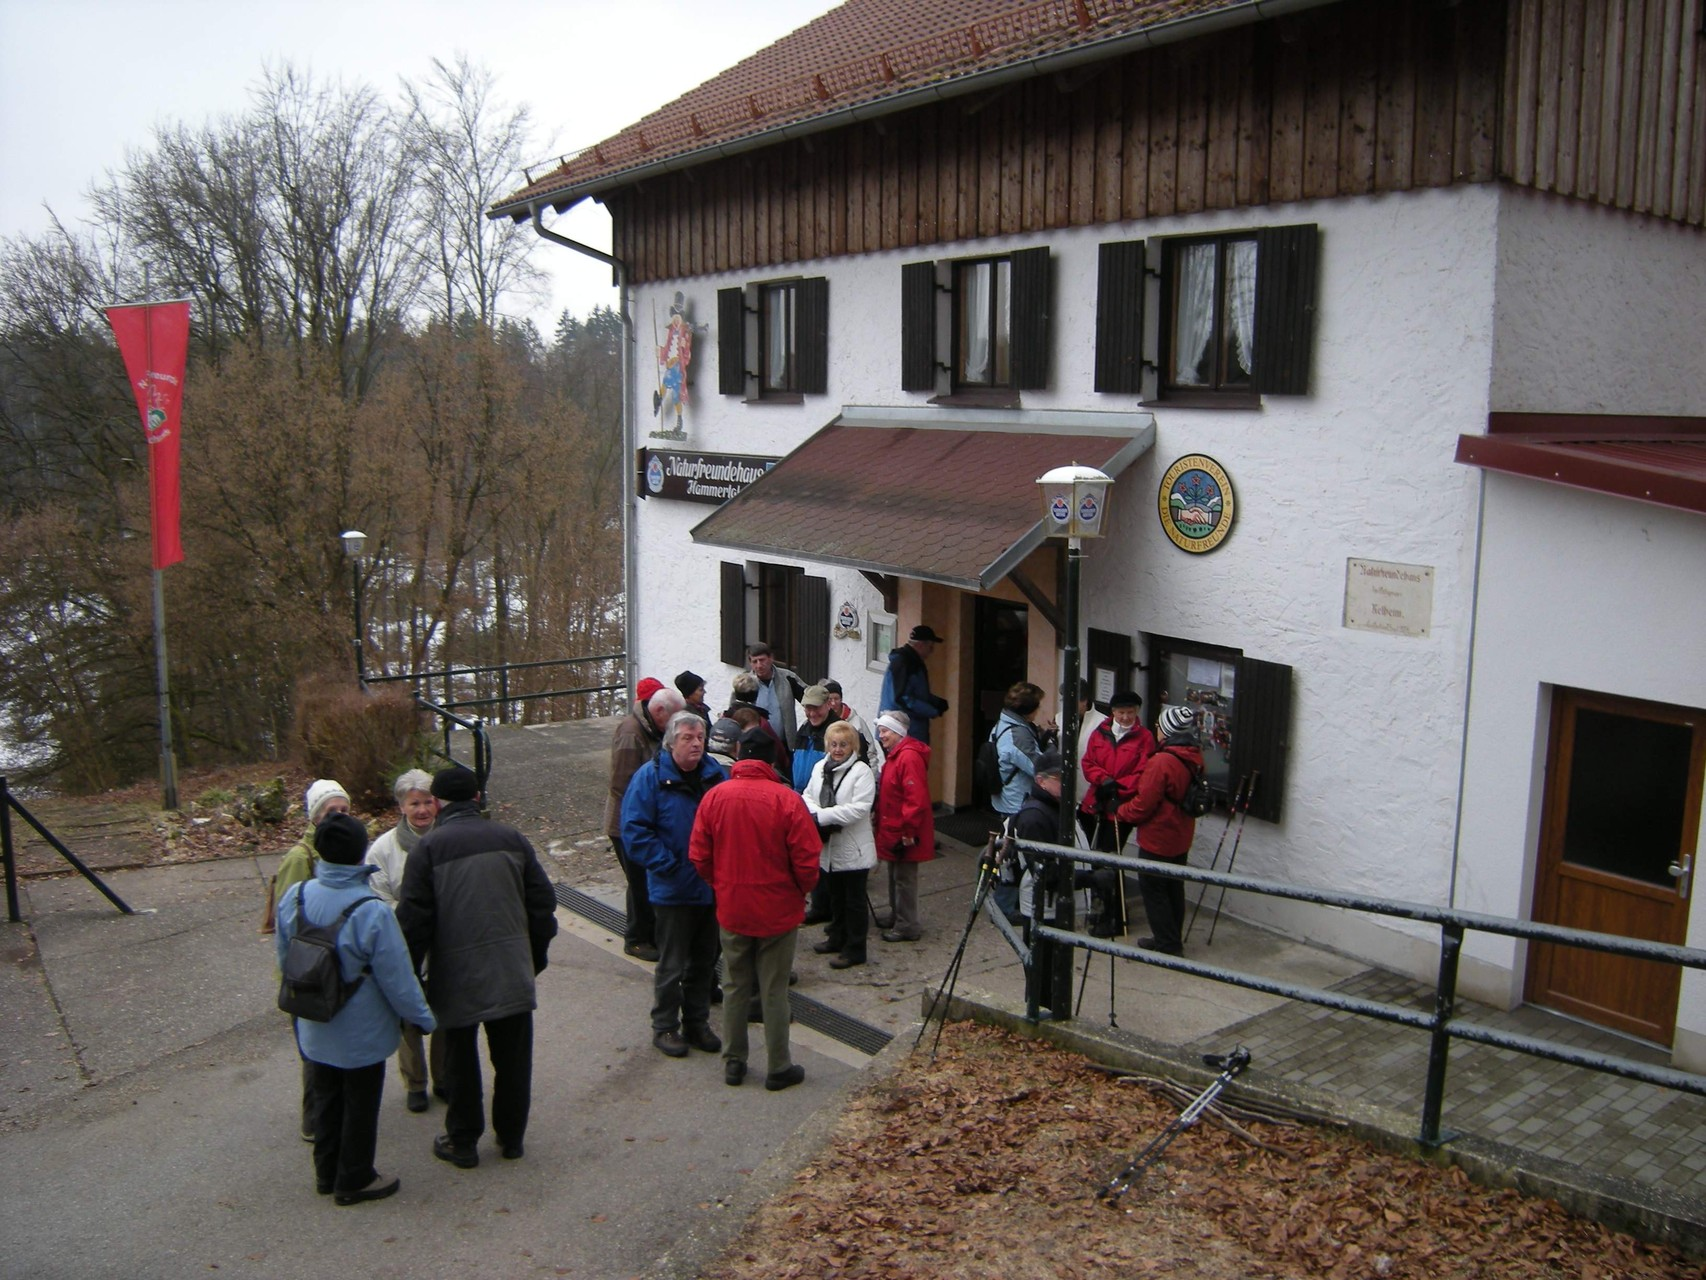 Naturatrail Hammertal